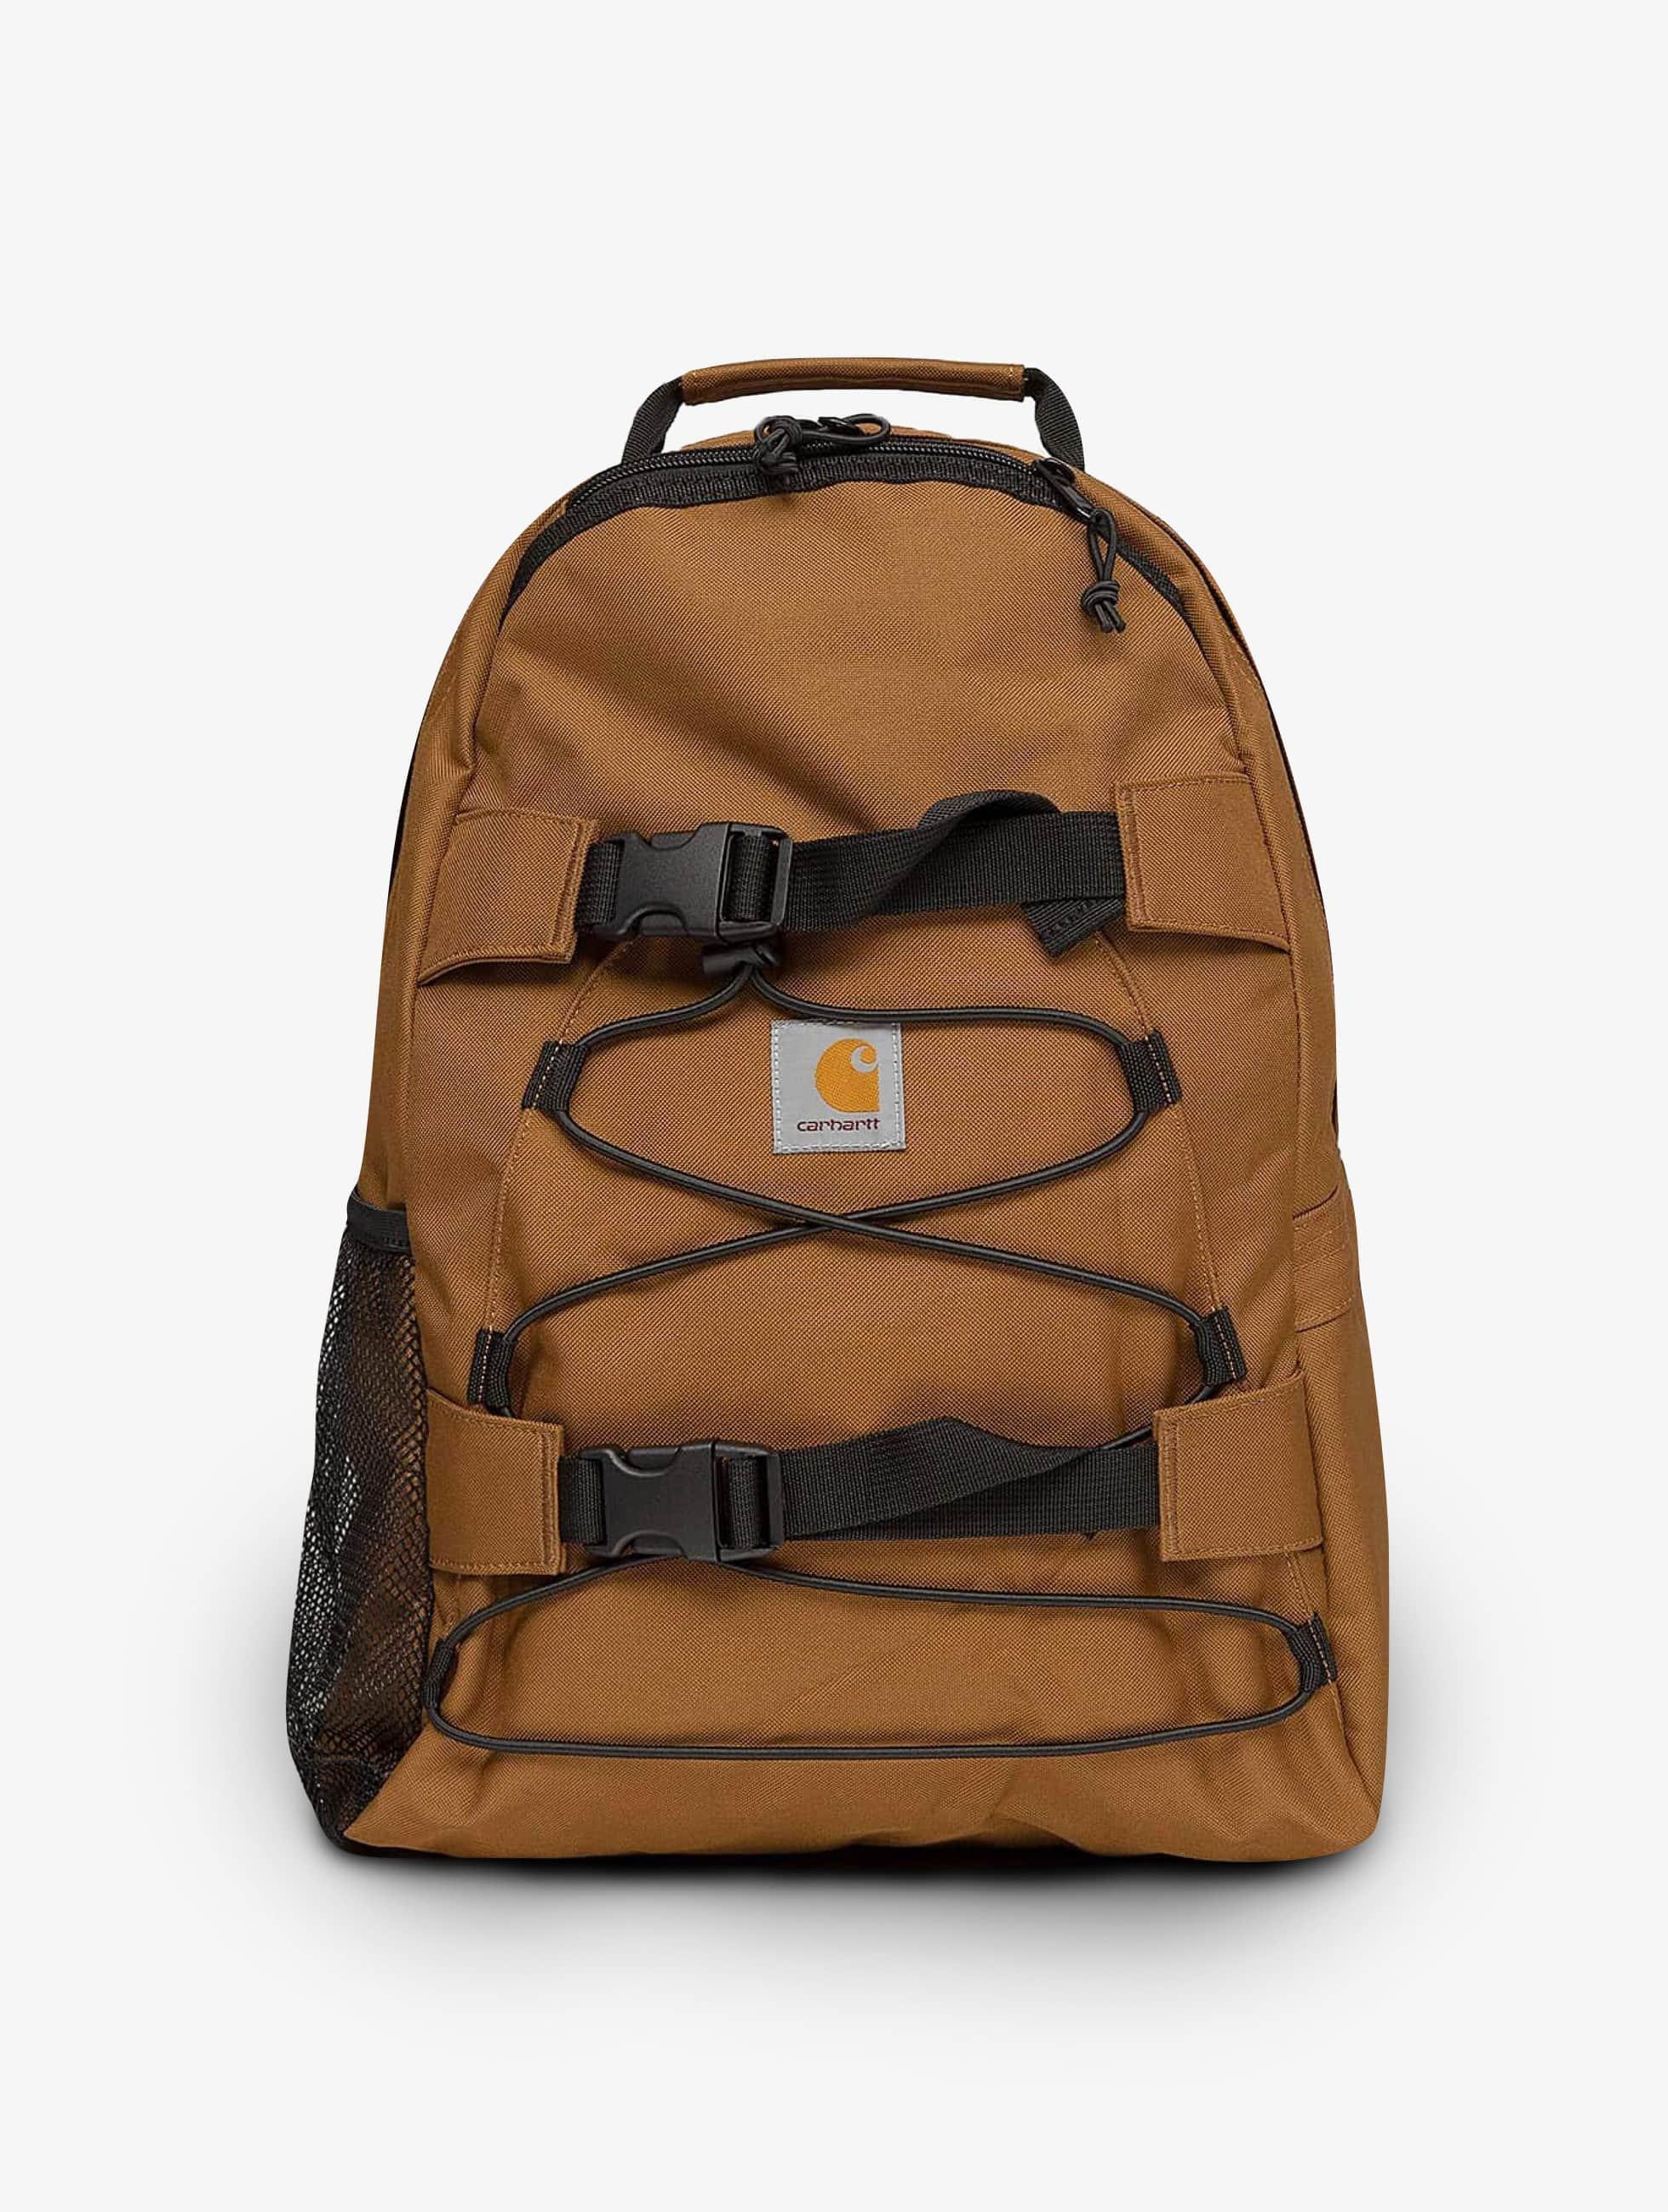 Carhartt WIP Рюкзак Kickflip коричневый